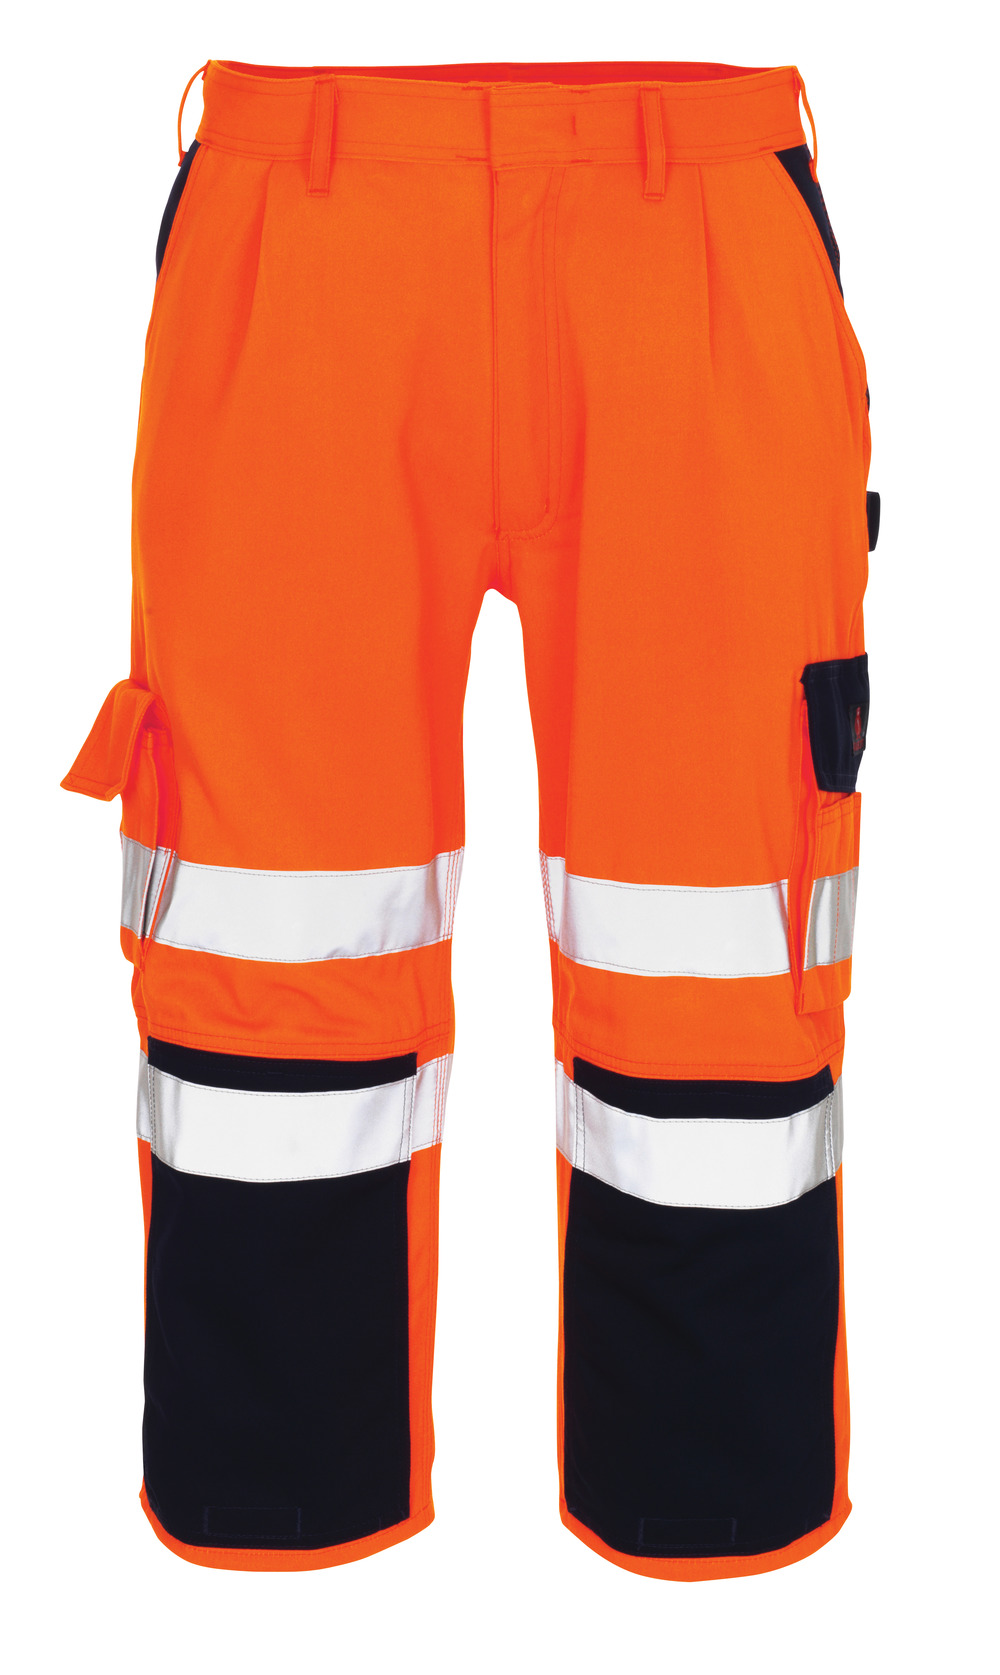 07149-860-141 ¾ Length Pants with kneepad pockets - hi-vis orange/navy